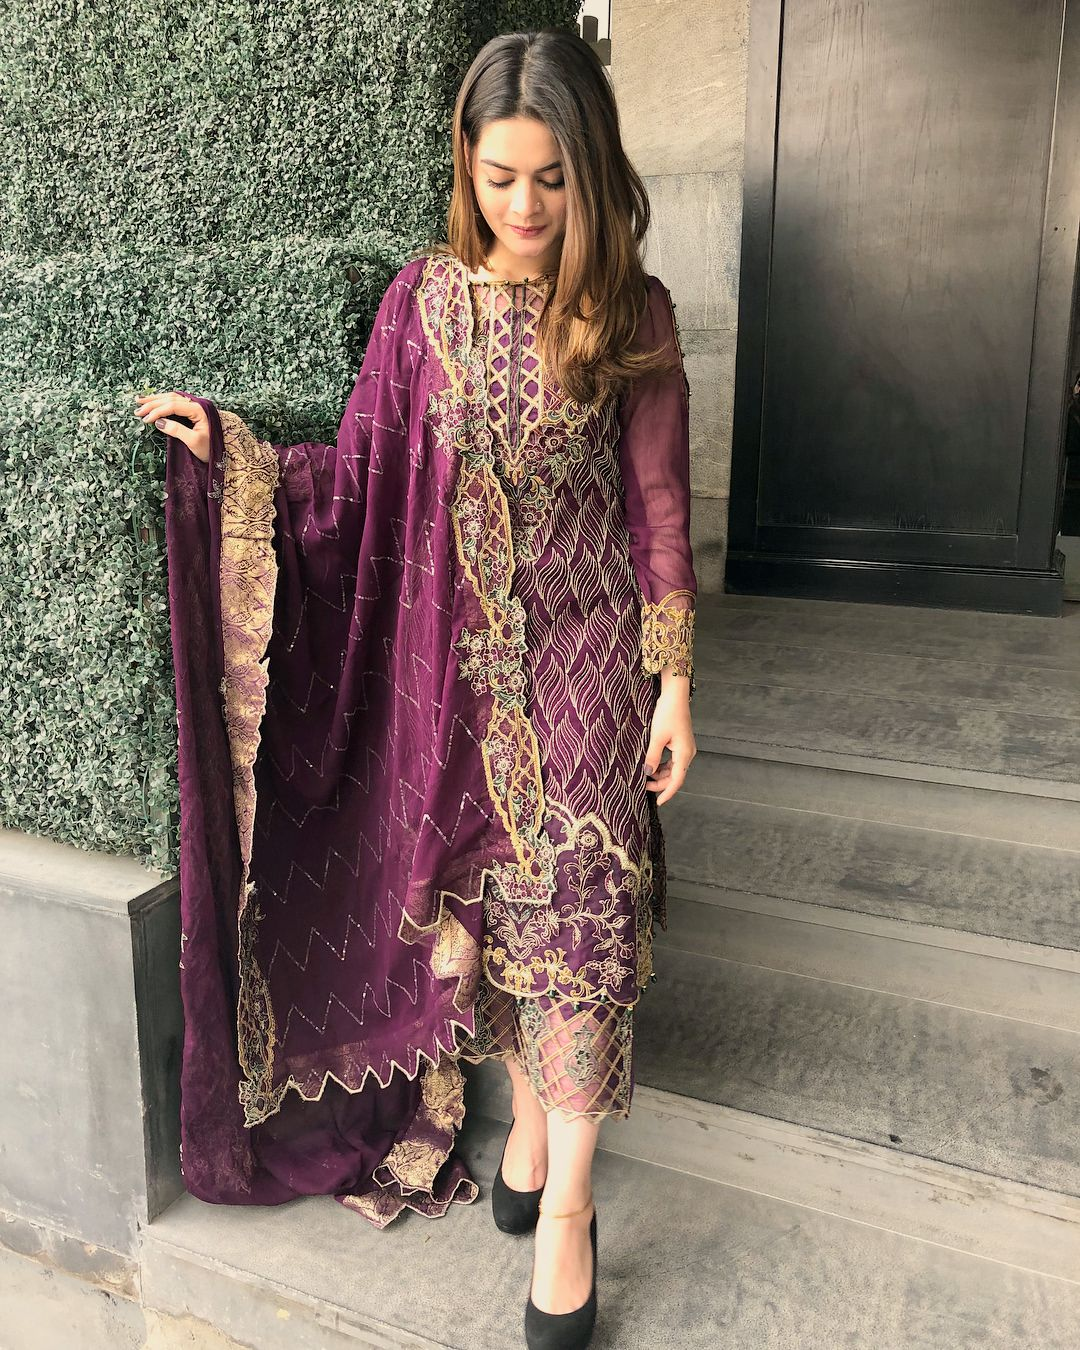 Purple dresses to wear to a wedding  Thankyou Sifonacollections fahmeenaaman sending this beautifull